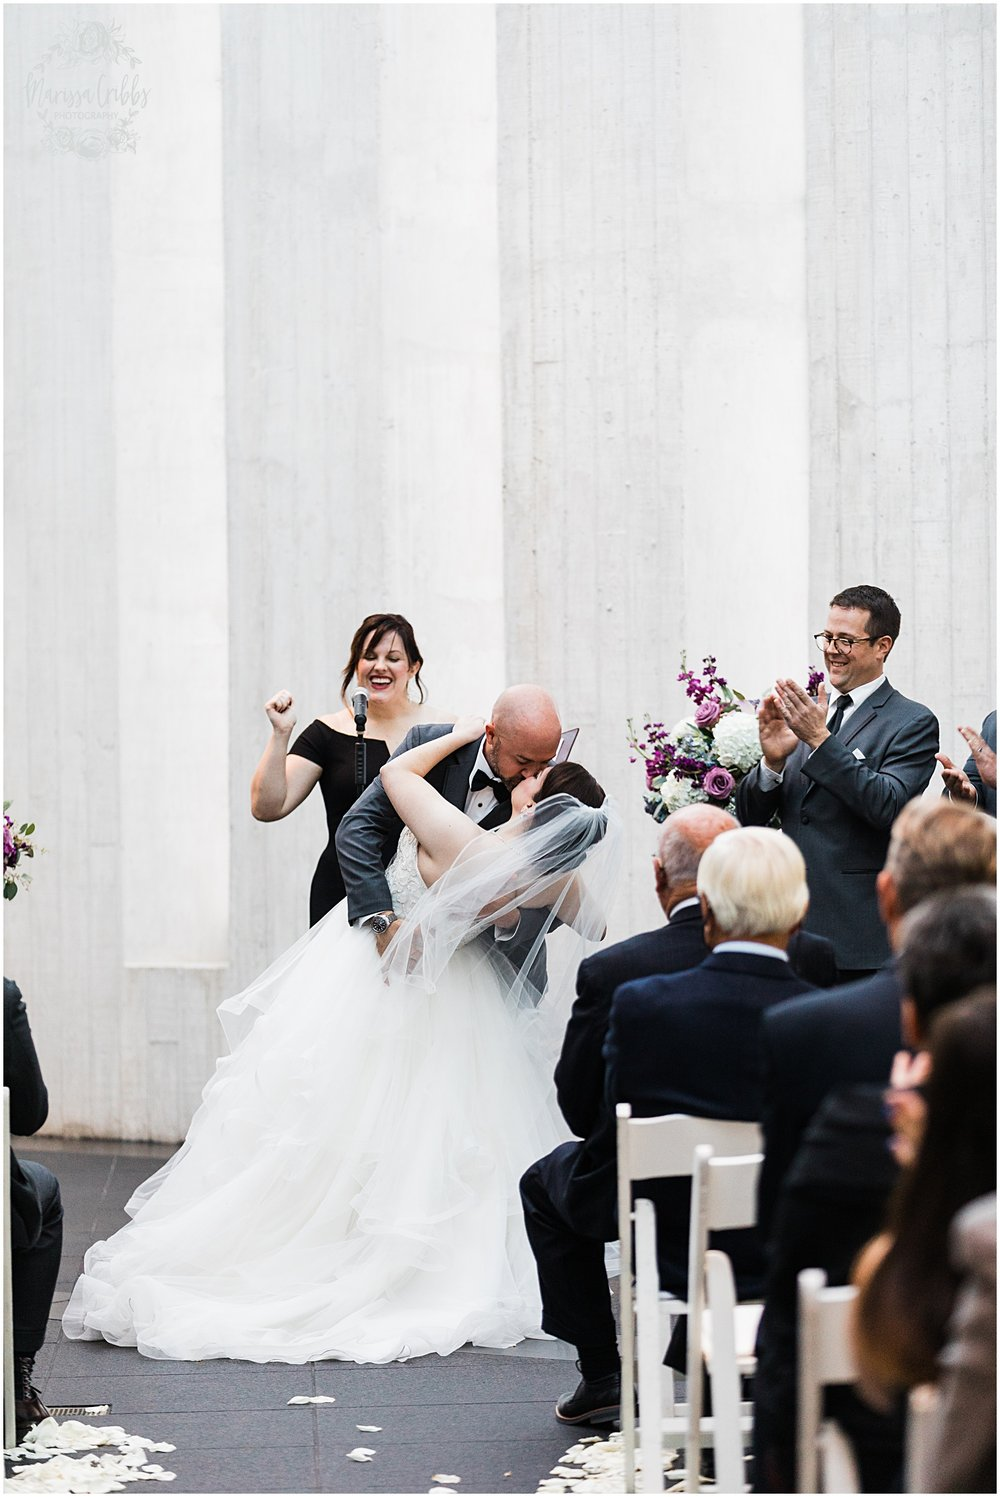 LAURA & DAN MARRIED   NELSON ATKINS MUSEUM   MARISSA CRIBBS PHOTOGRAPHY_7022.jpg